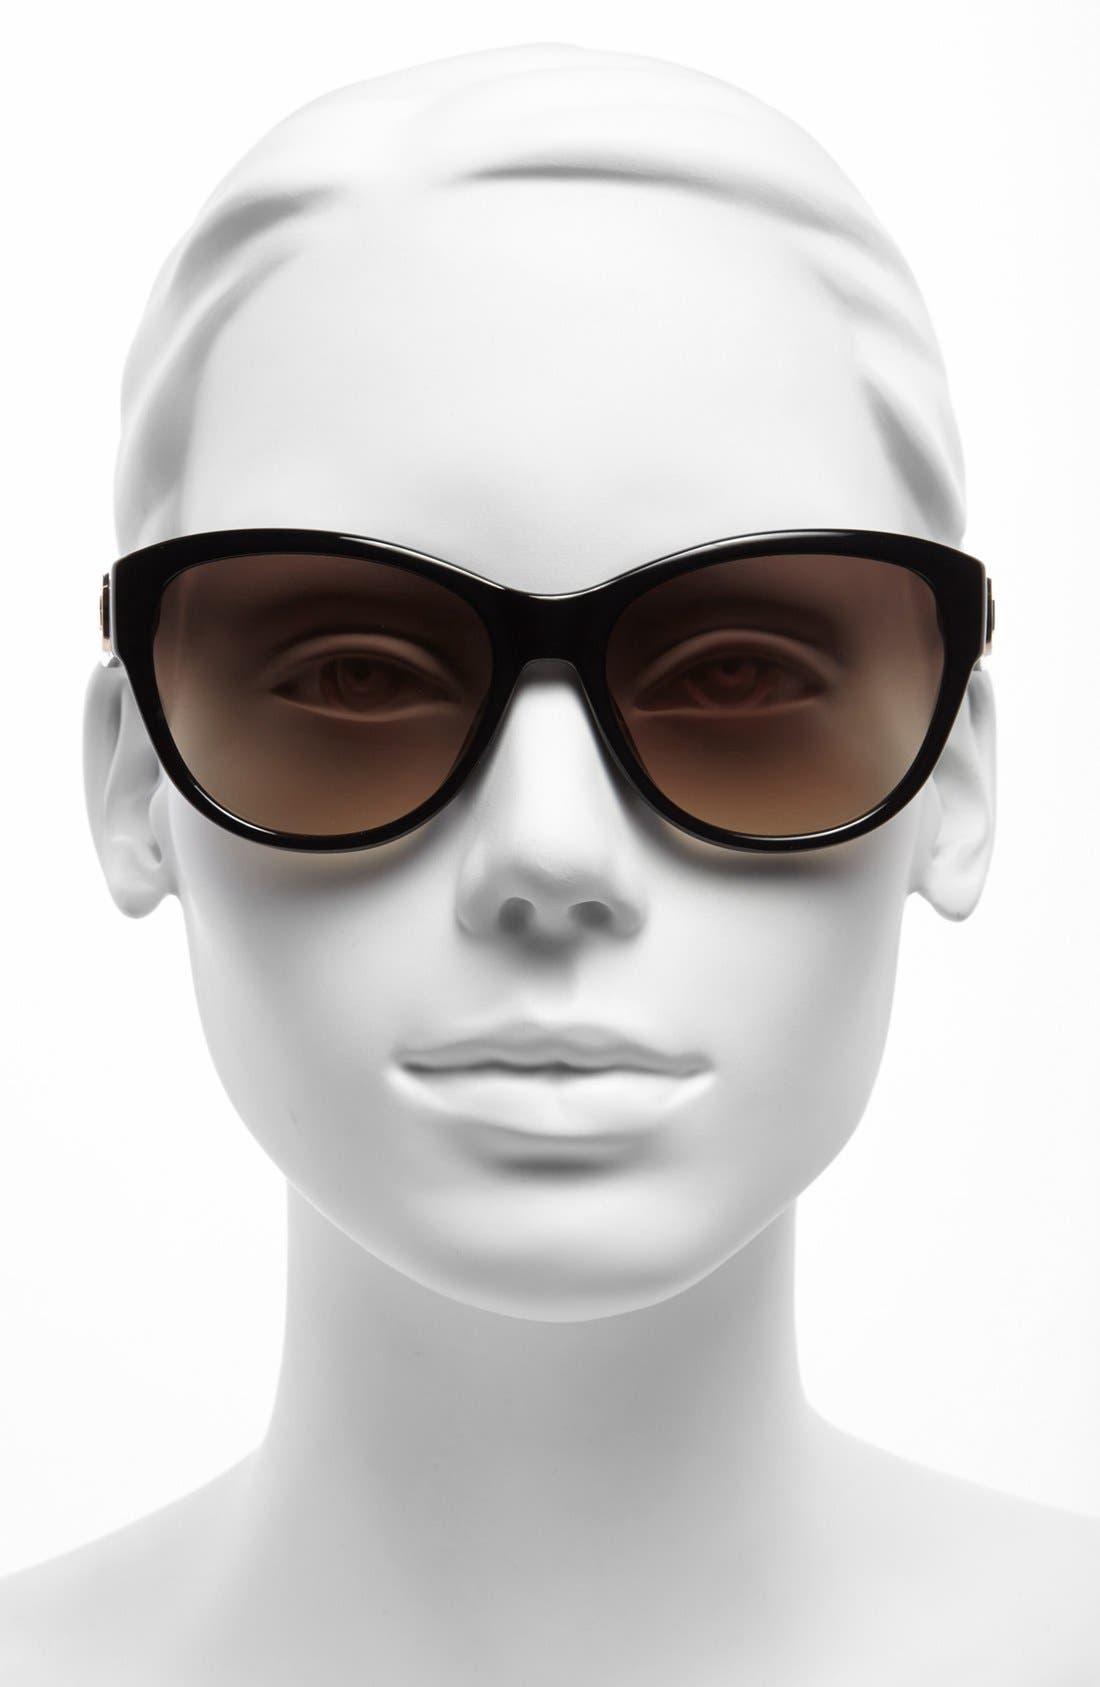 MICHAEL MICHAEL KORS,                             'Vivian' 57mm Sunglasses,                             Alternate thumbnail 2, color,                             001